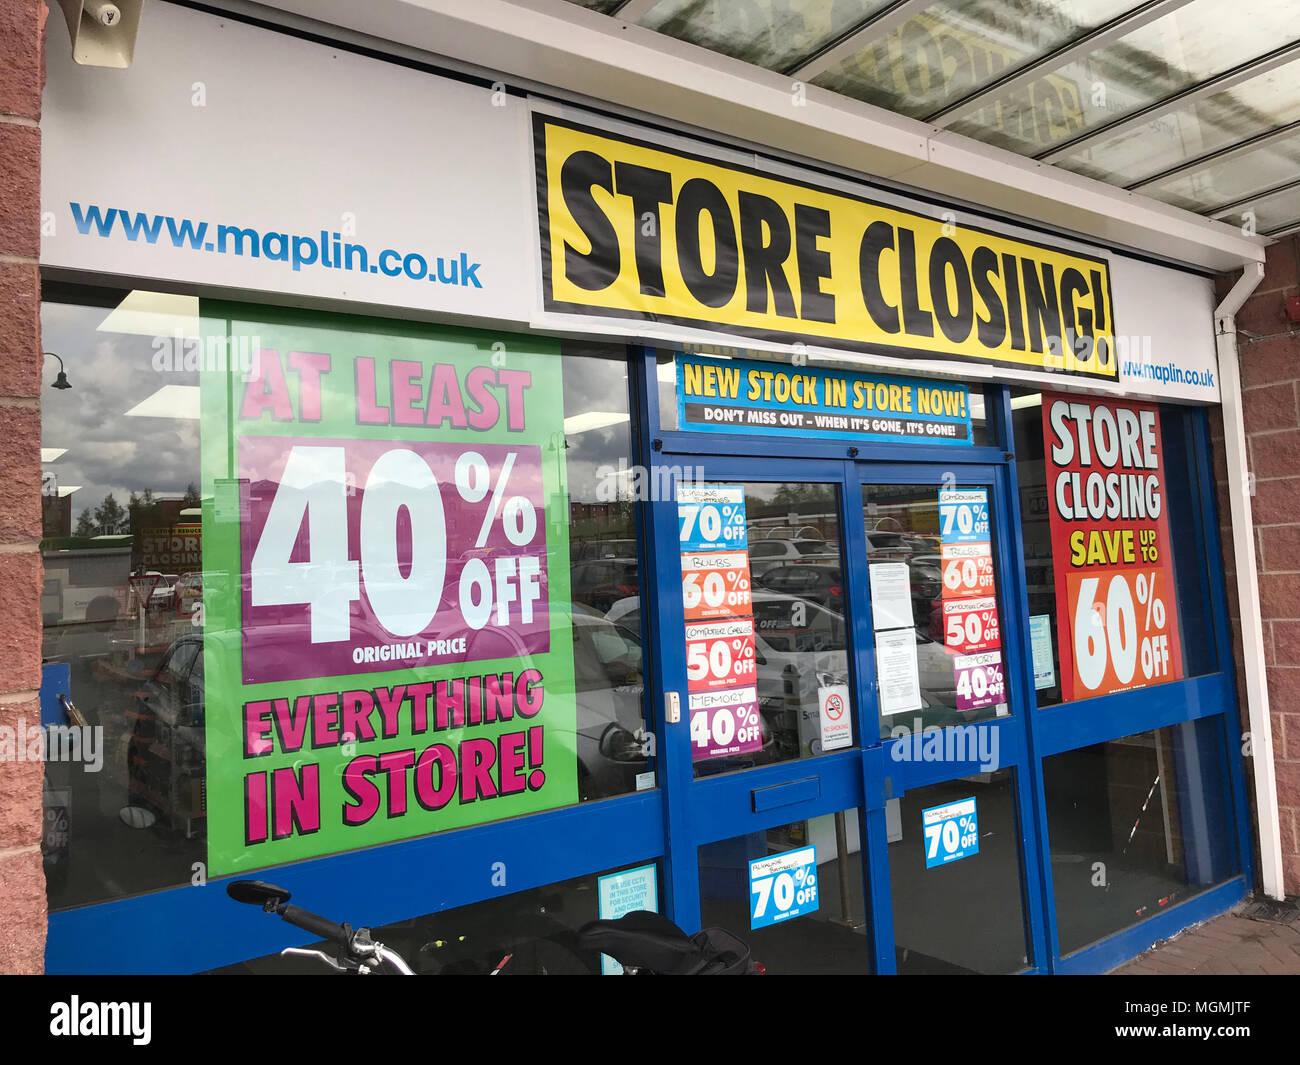 GoTonySmith,Maplin,electronics,maplins,store,shop,closing,Cheshire,UK,receiver,winding